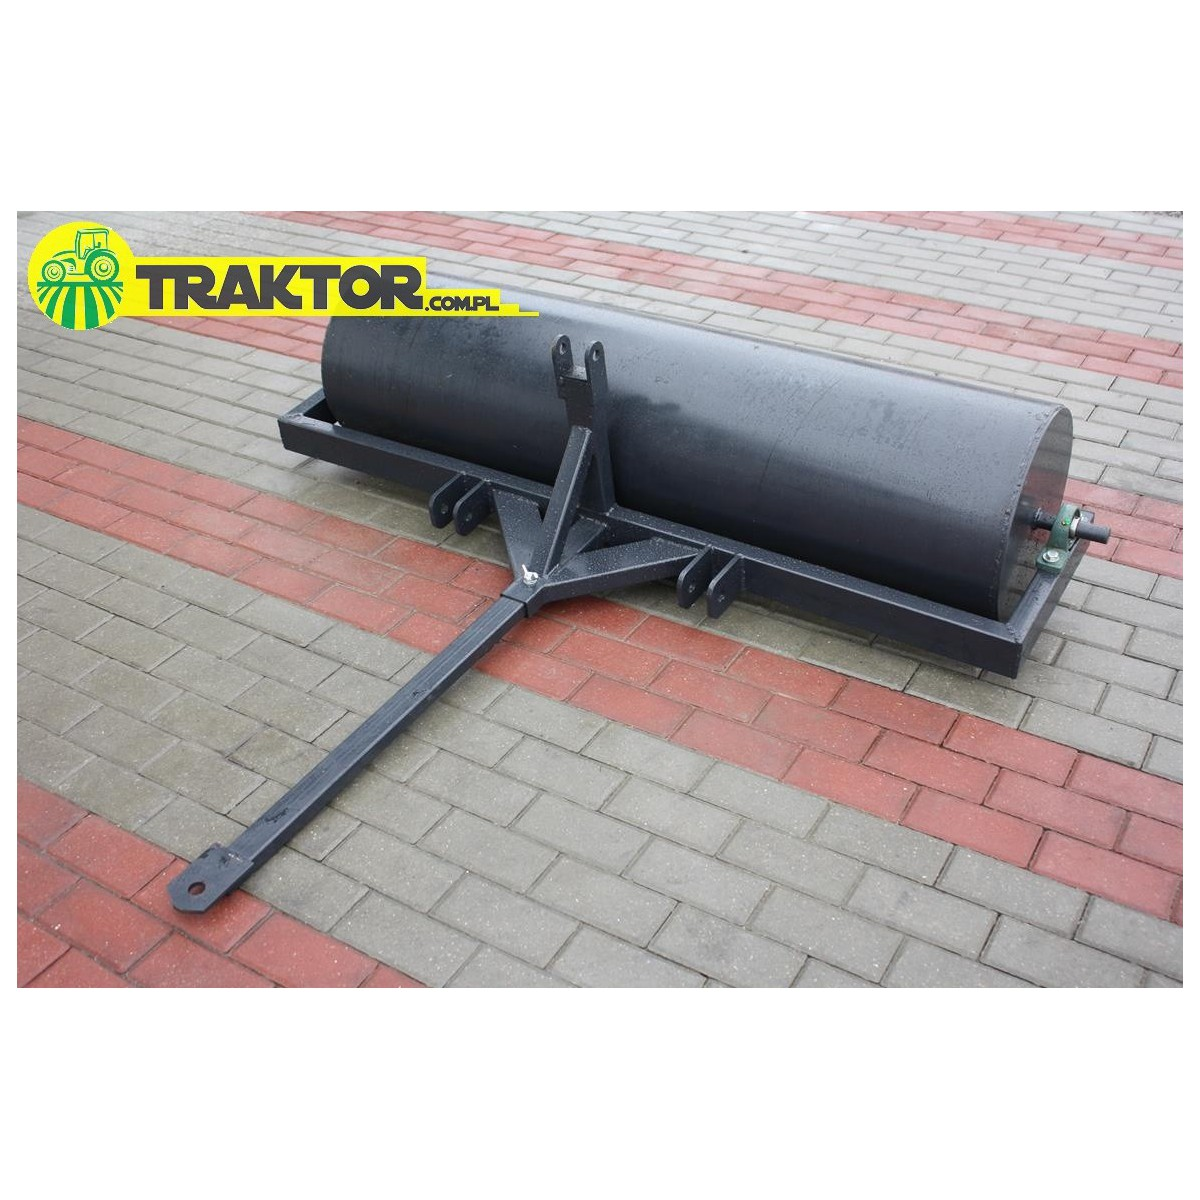 Tractor roller 140-150 cm 100-280 kg